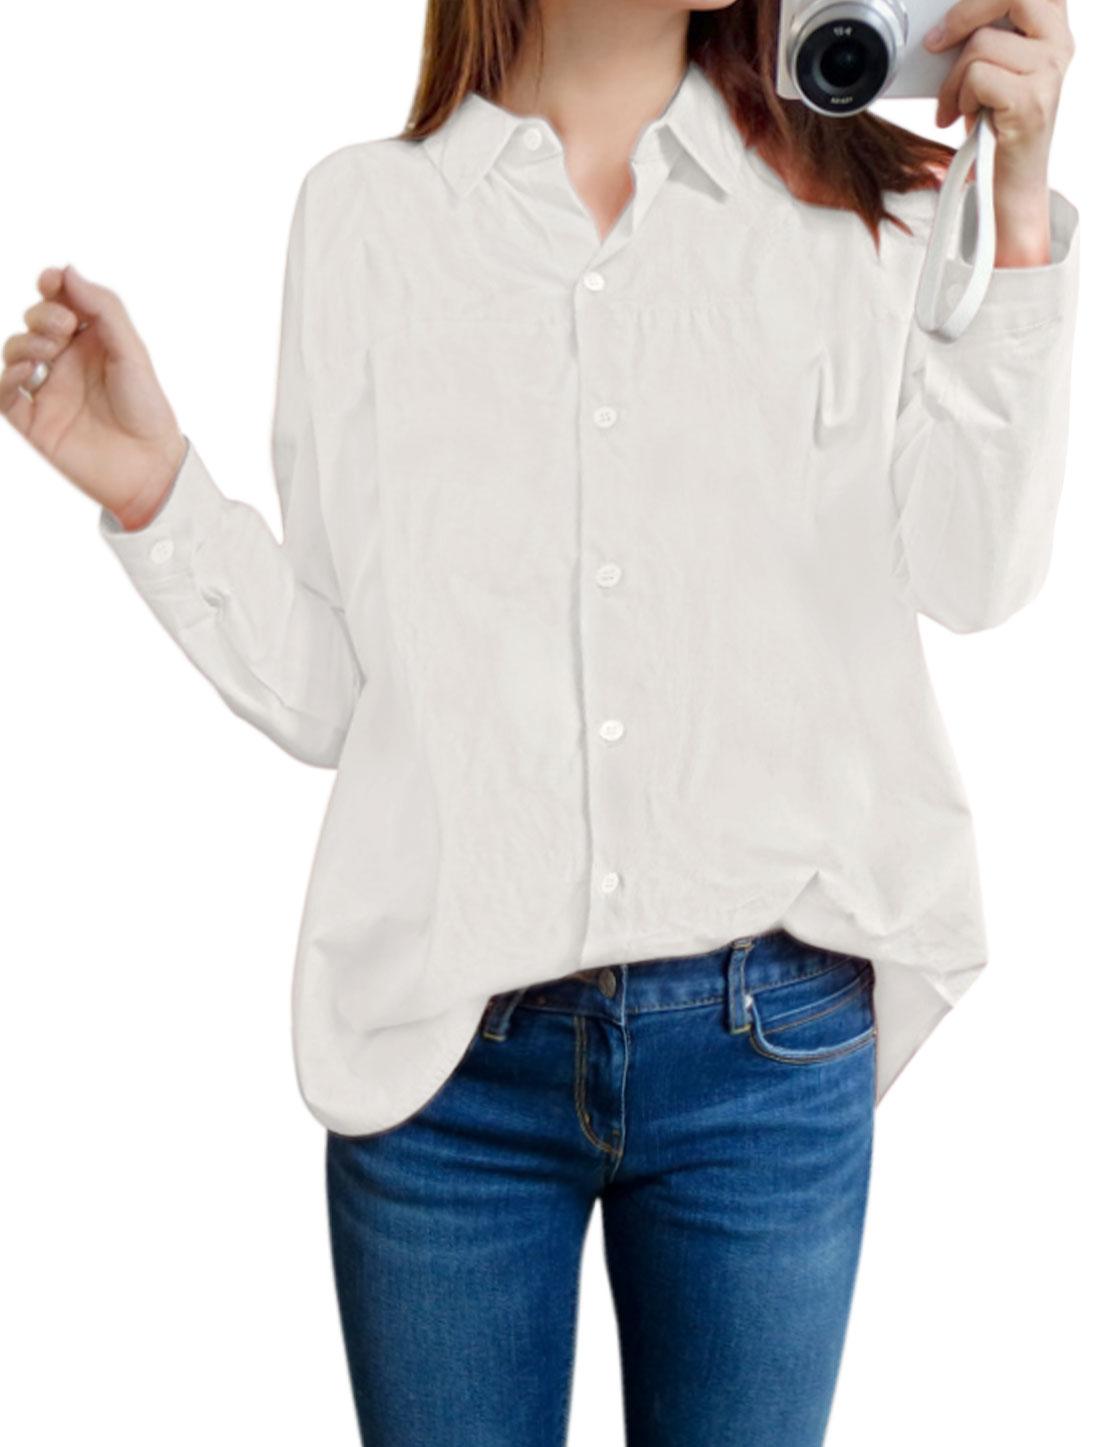 Women Collared Round Hem Batwing Sleeves Tunic Shirt White XS